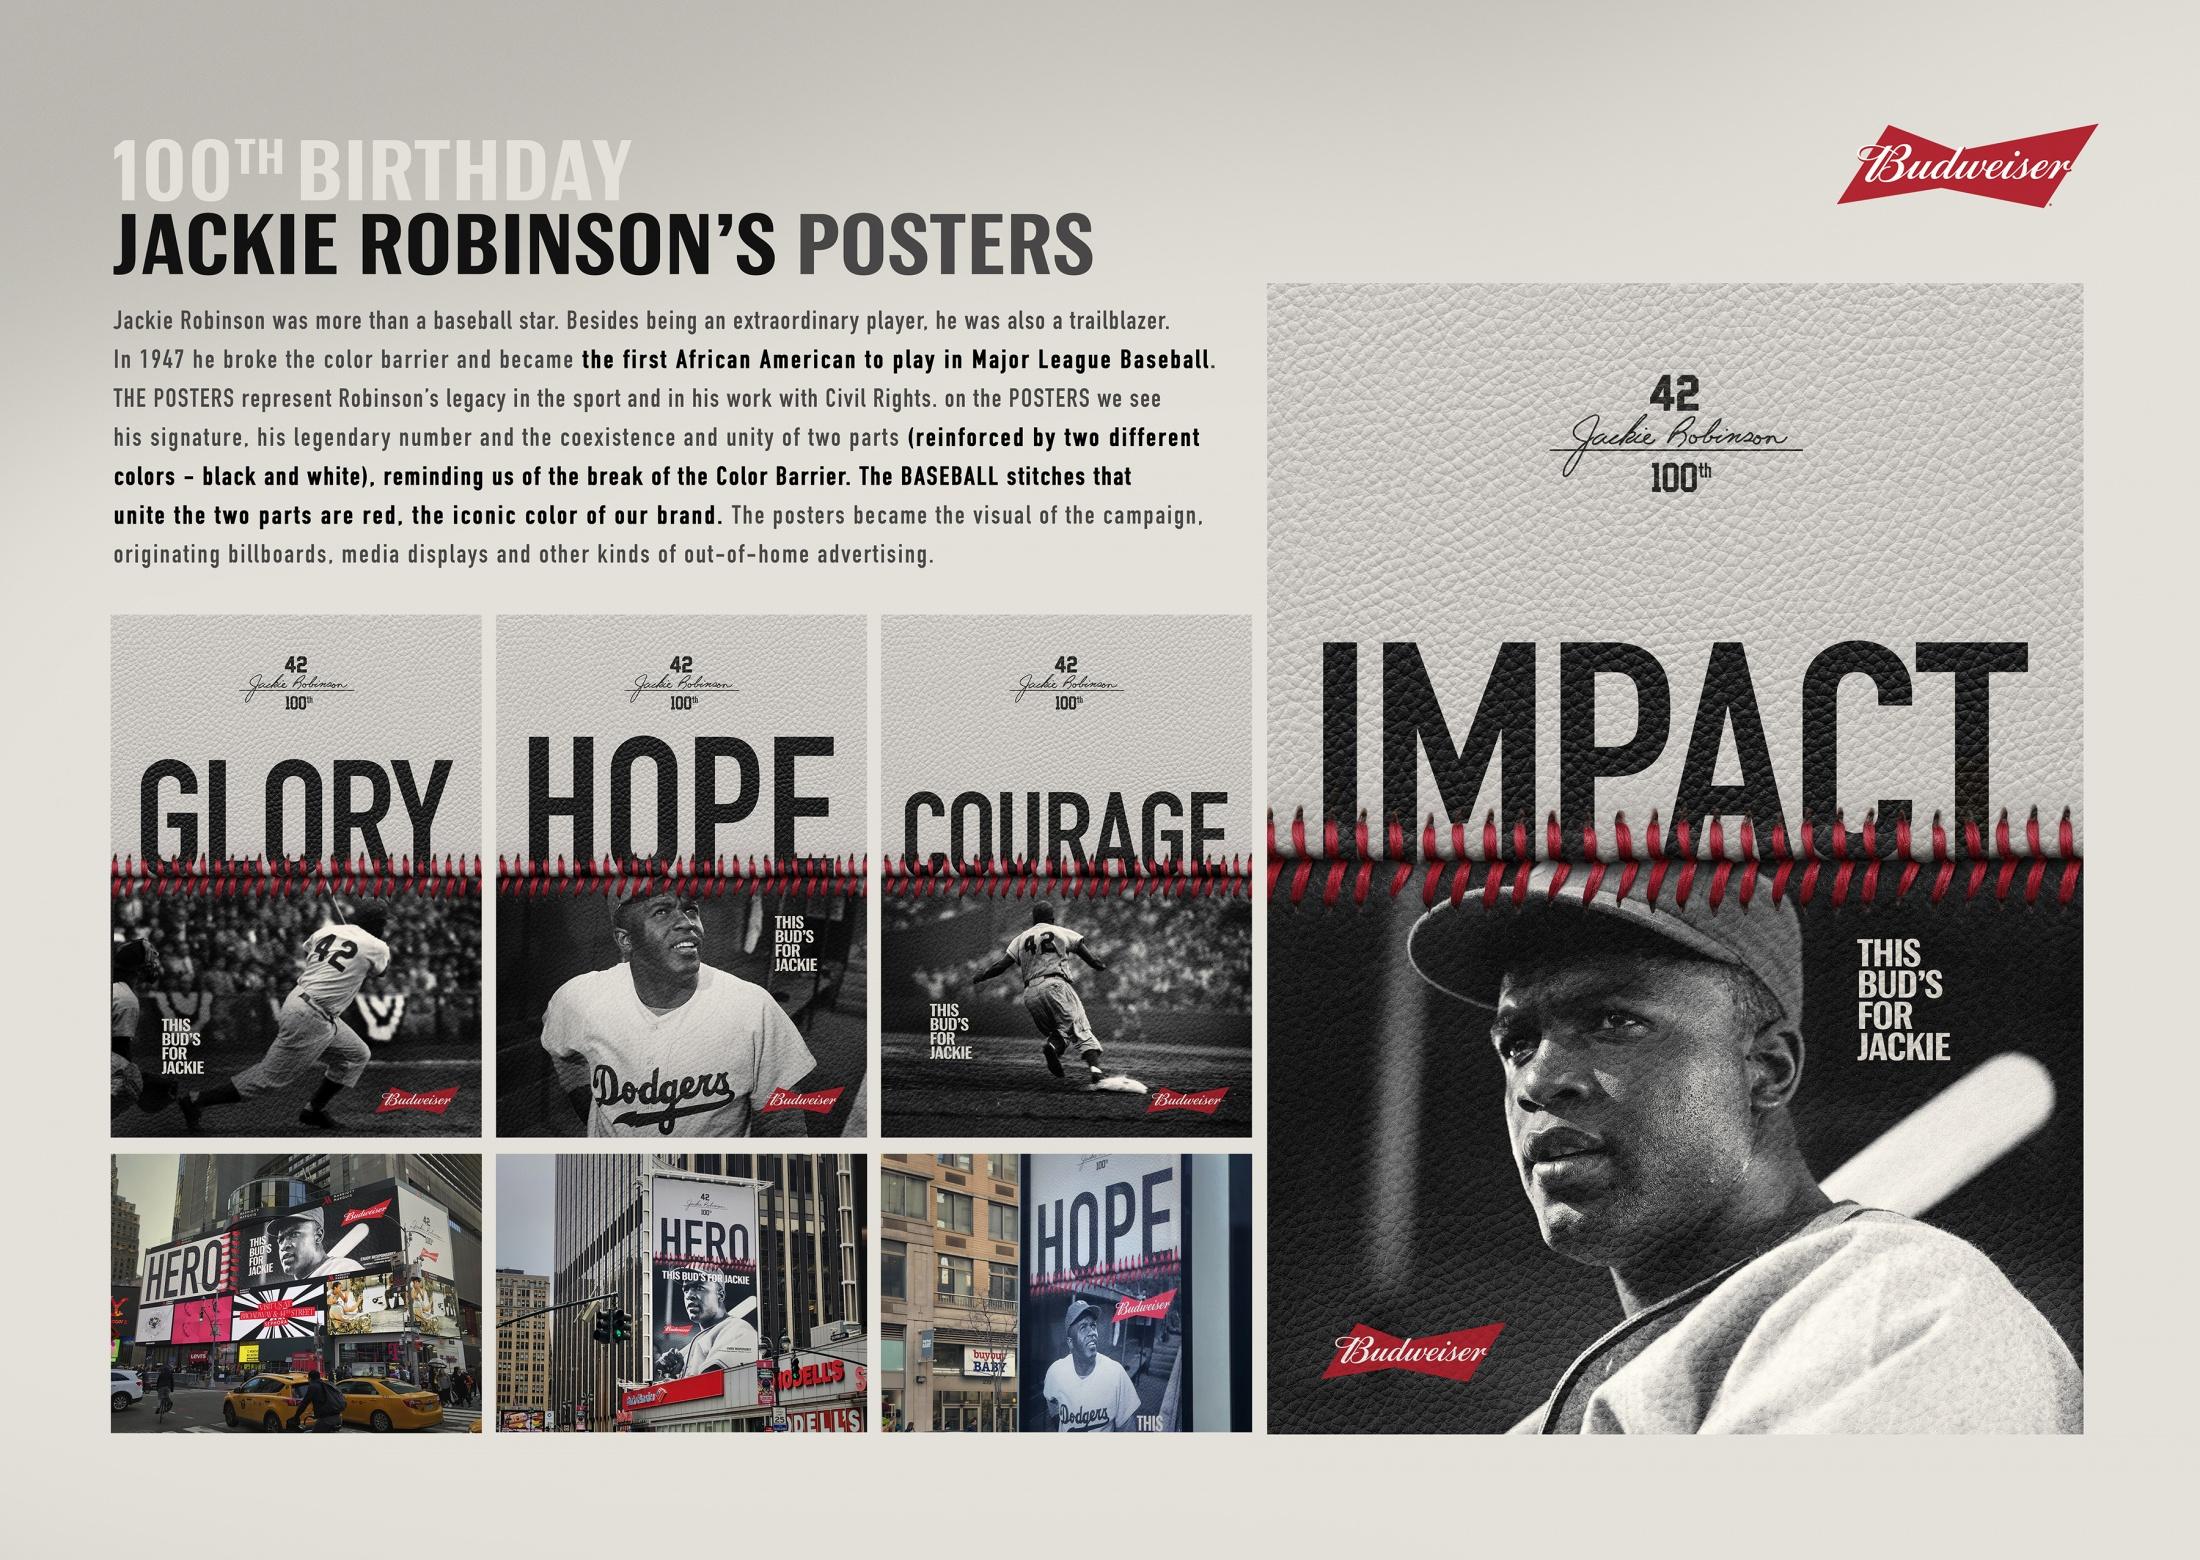 Thumbnail for Budweiser Jackie Robinson